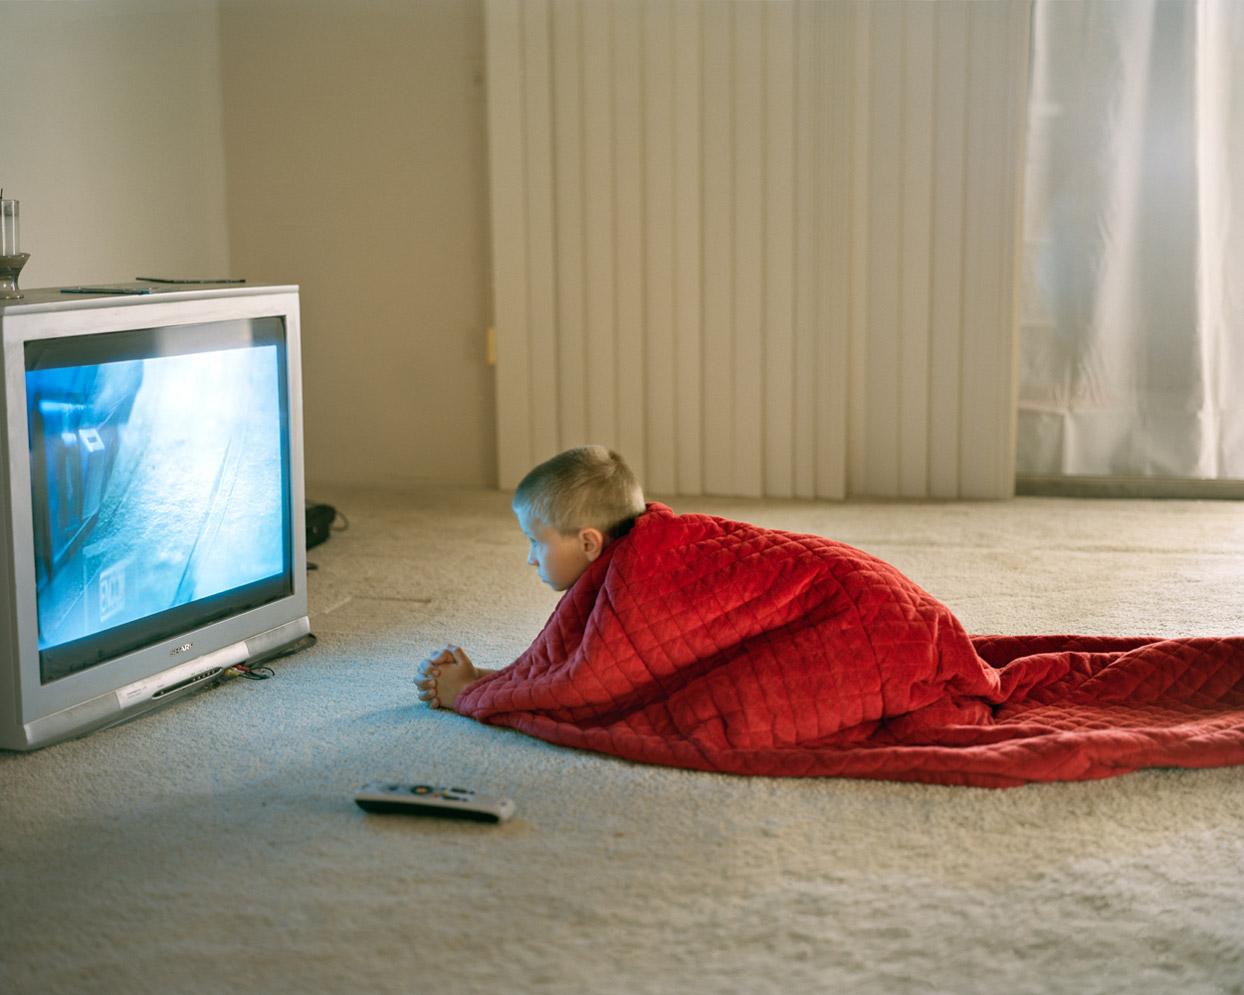 Red Blanket, 2011